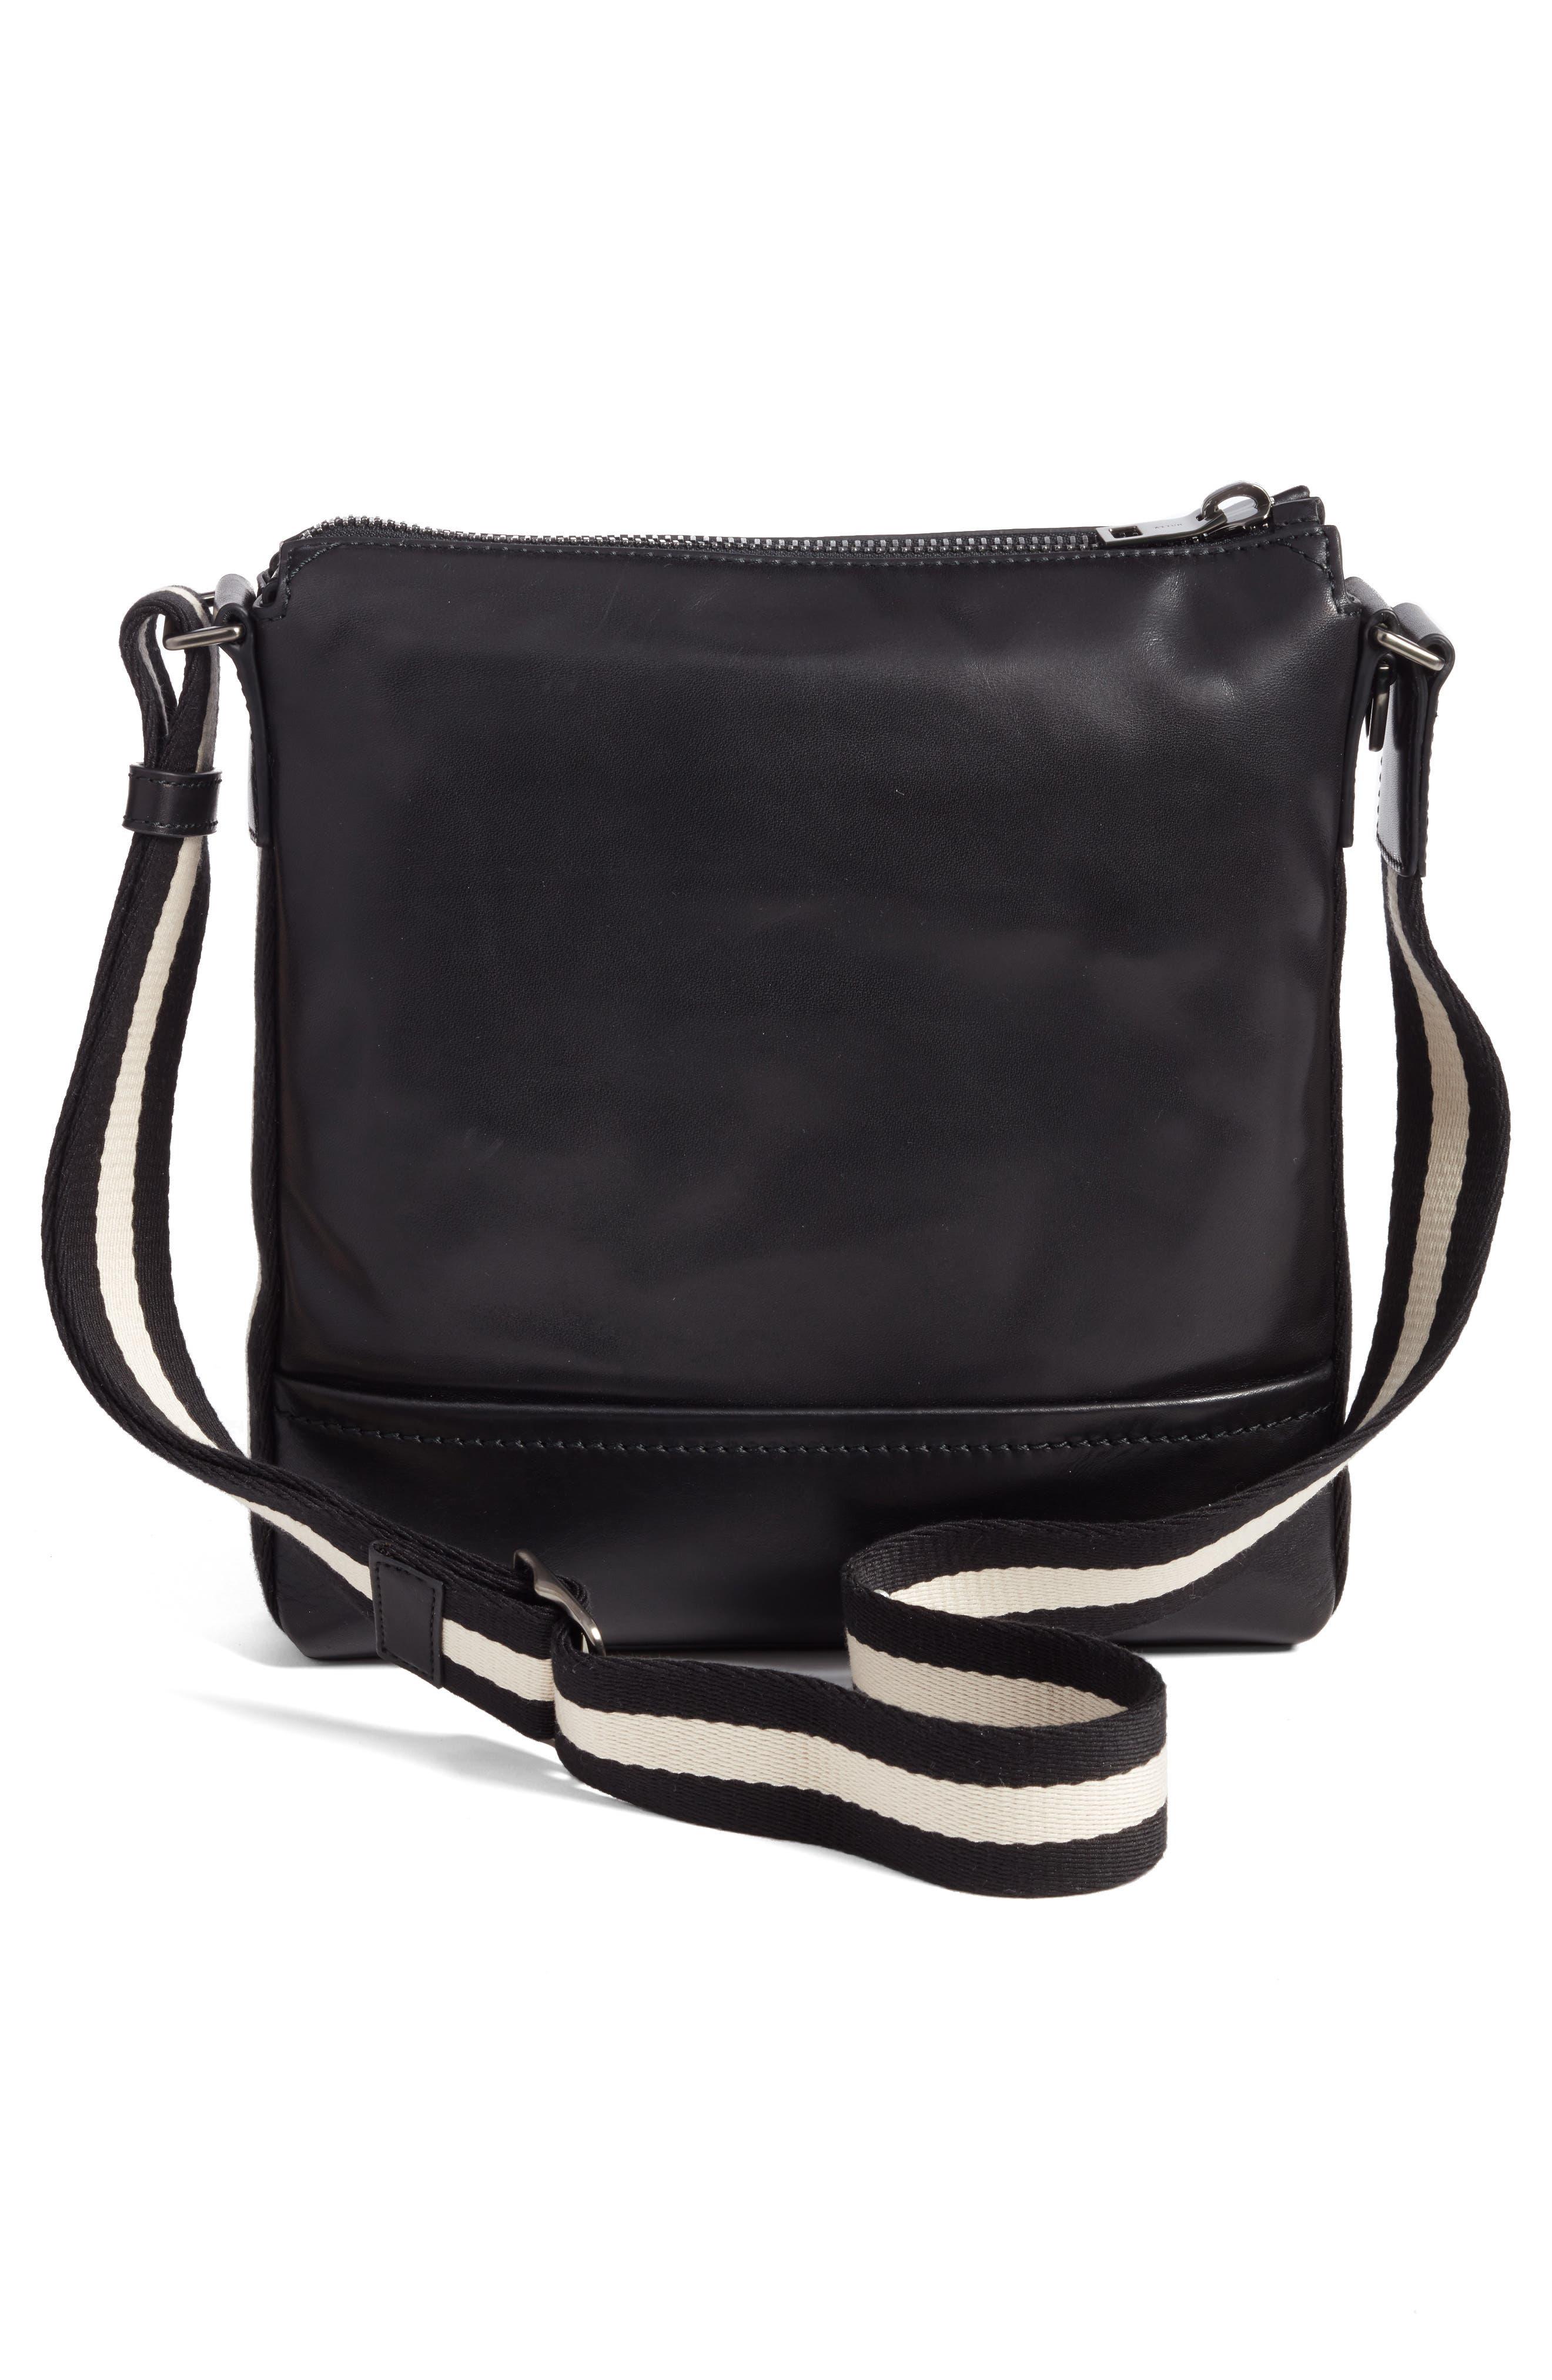 BALLY,                             Trezzini Leather Crossbody Bag,                             Alternate thumbnail 3, color,                             001